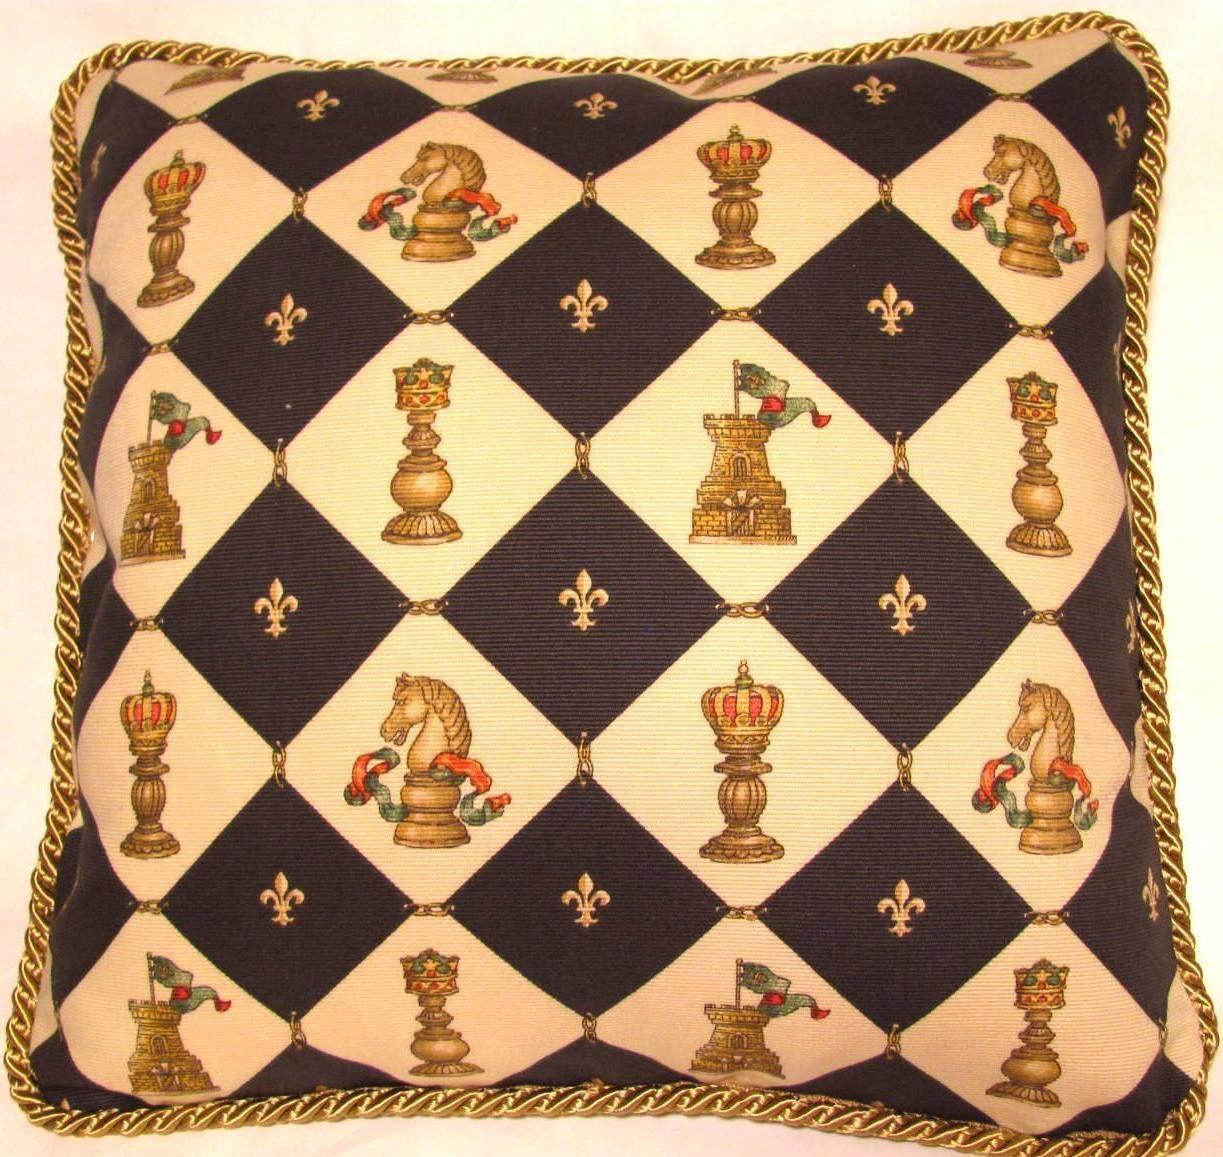 Scrapsmart red hattitude quilt pillows software collection jpeg ms word files cdrhfq33